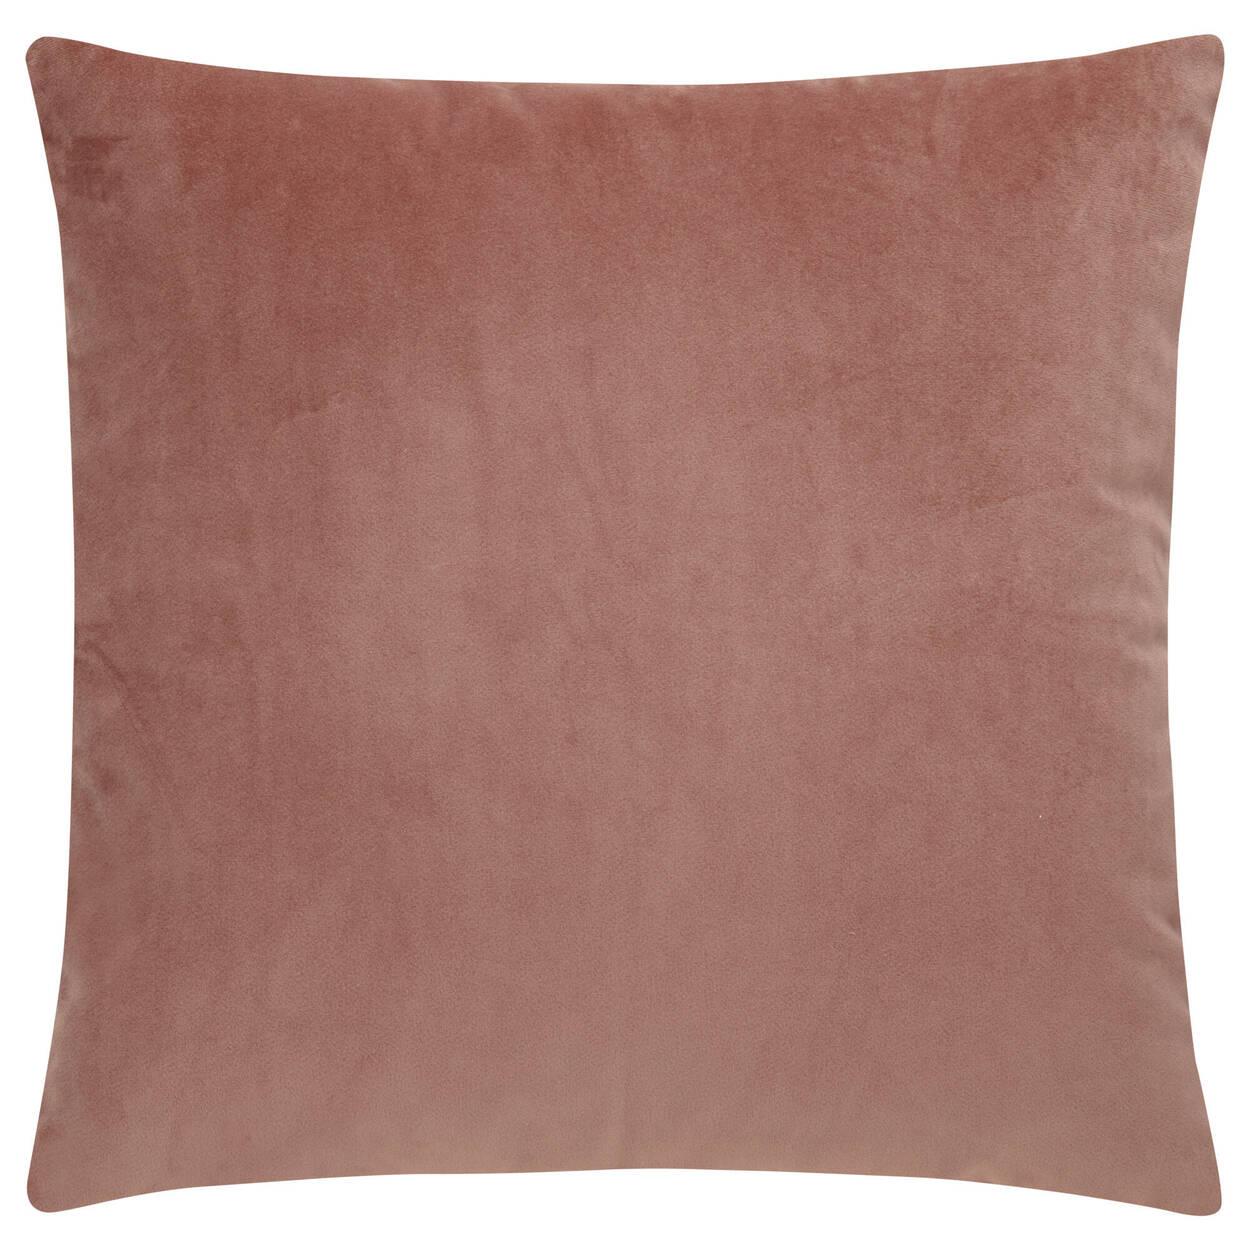 "Gunda Decorative Pillow Cover 18"" X 18"""